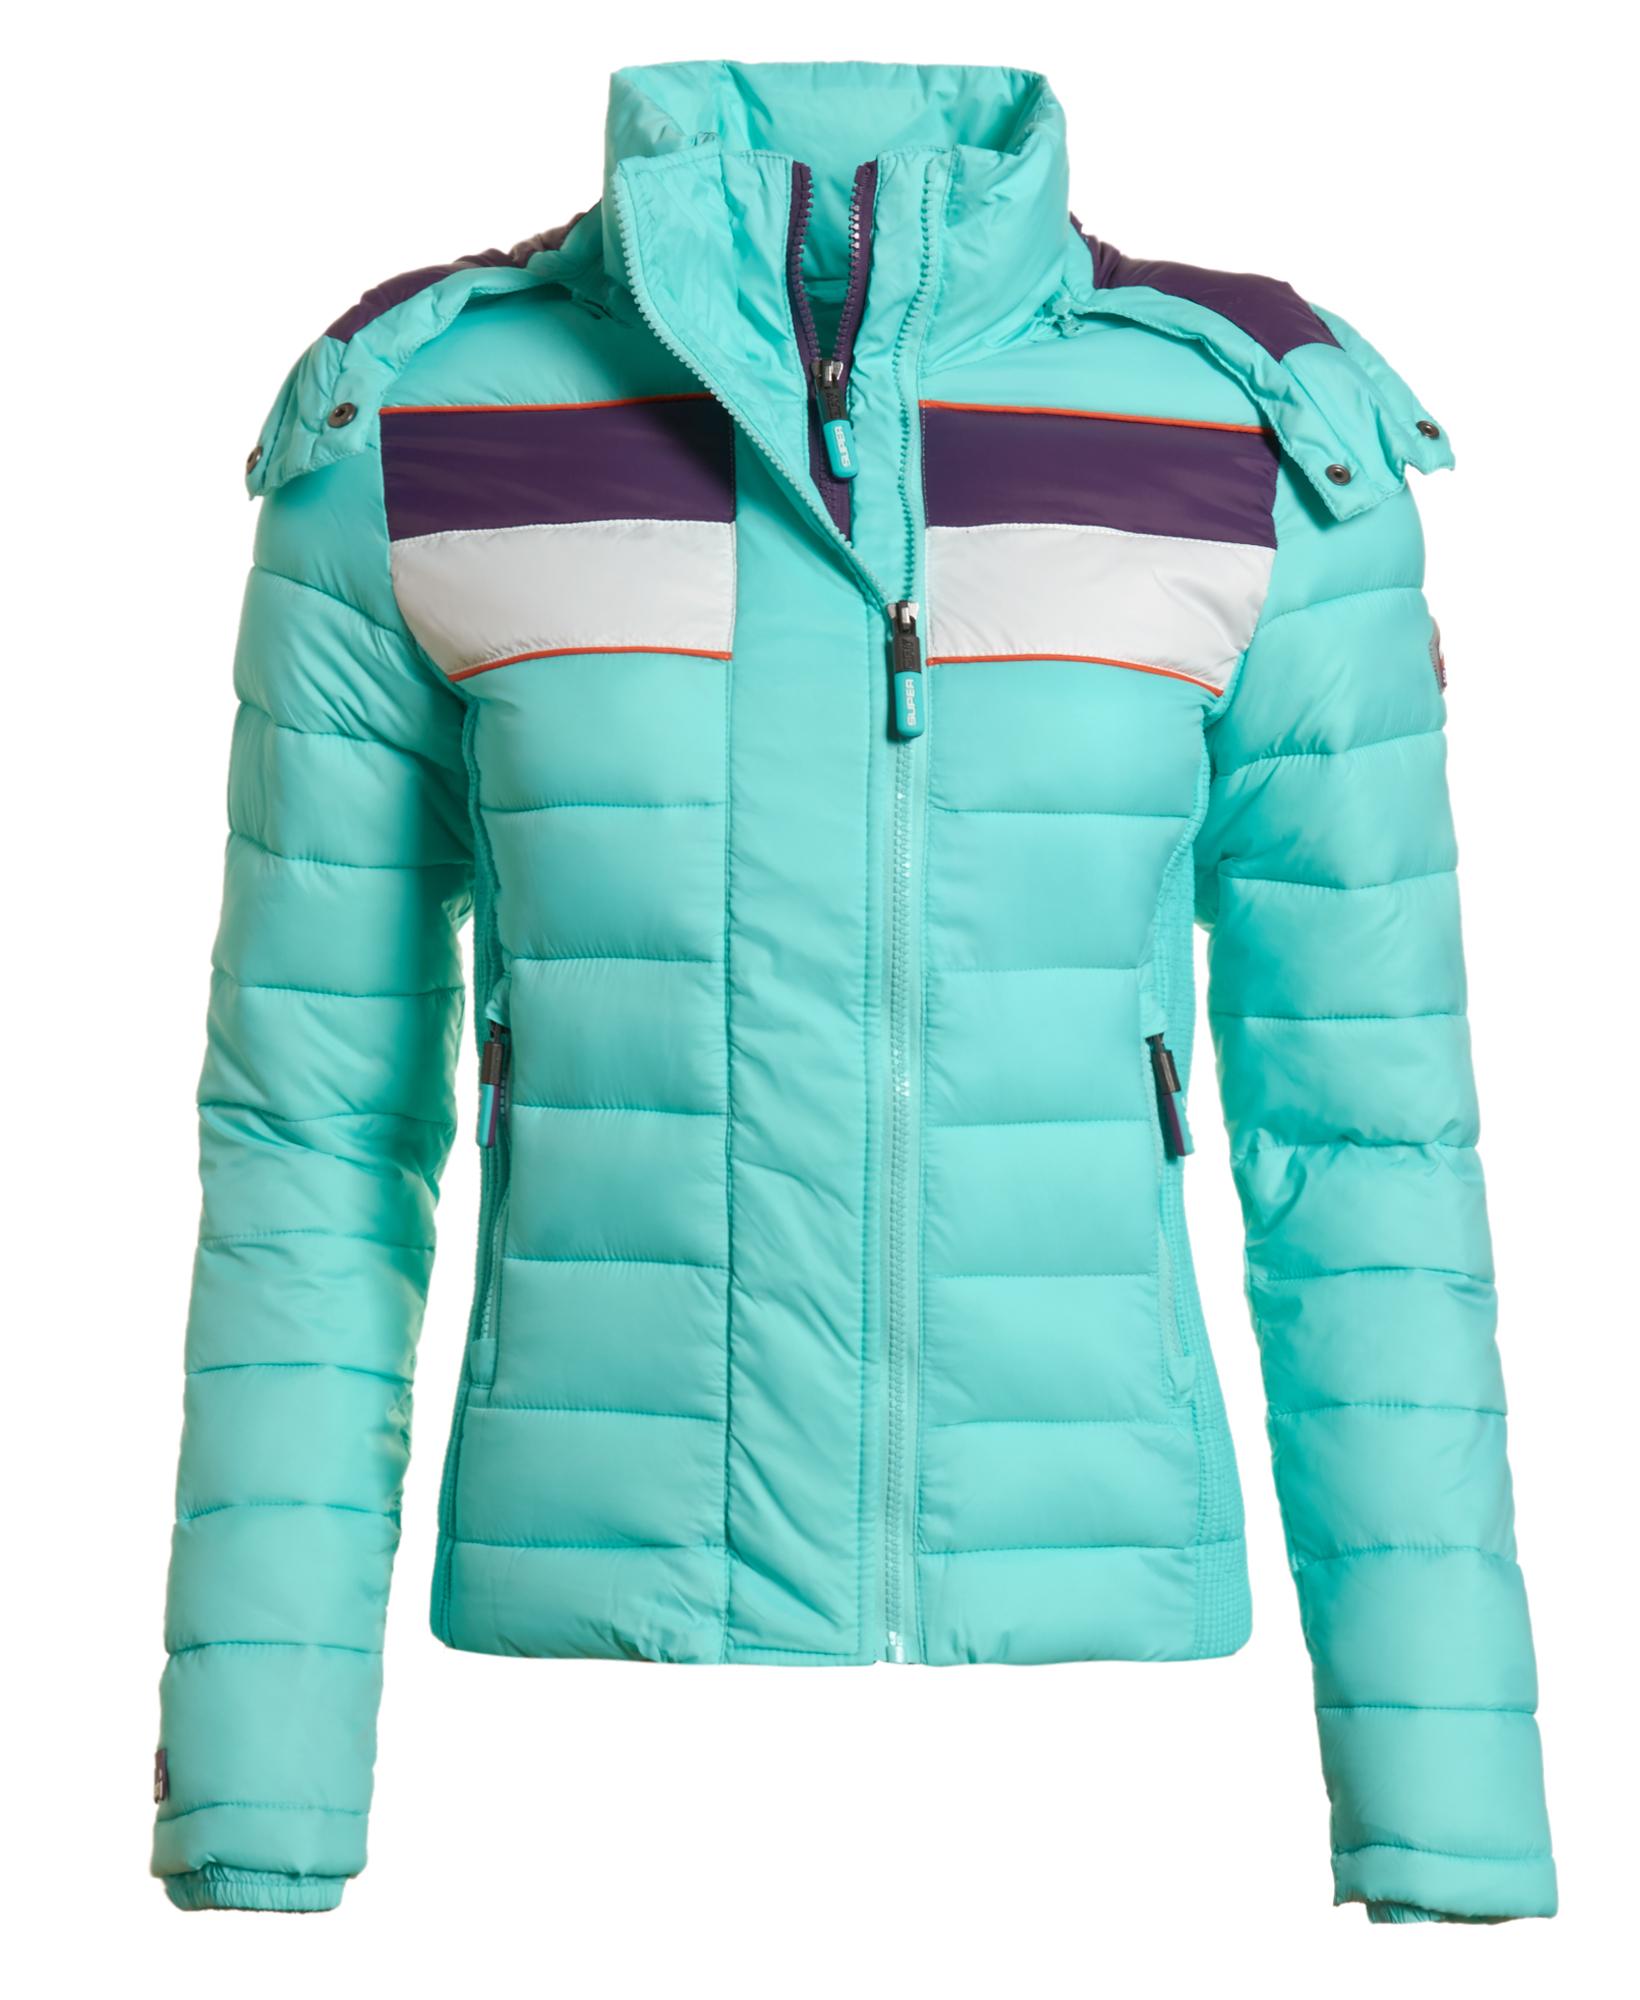 neue damen superdry jacke sun sport fuji jacket opal blau. Black Bedroom Furniture Sets. Home Design Ideas